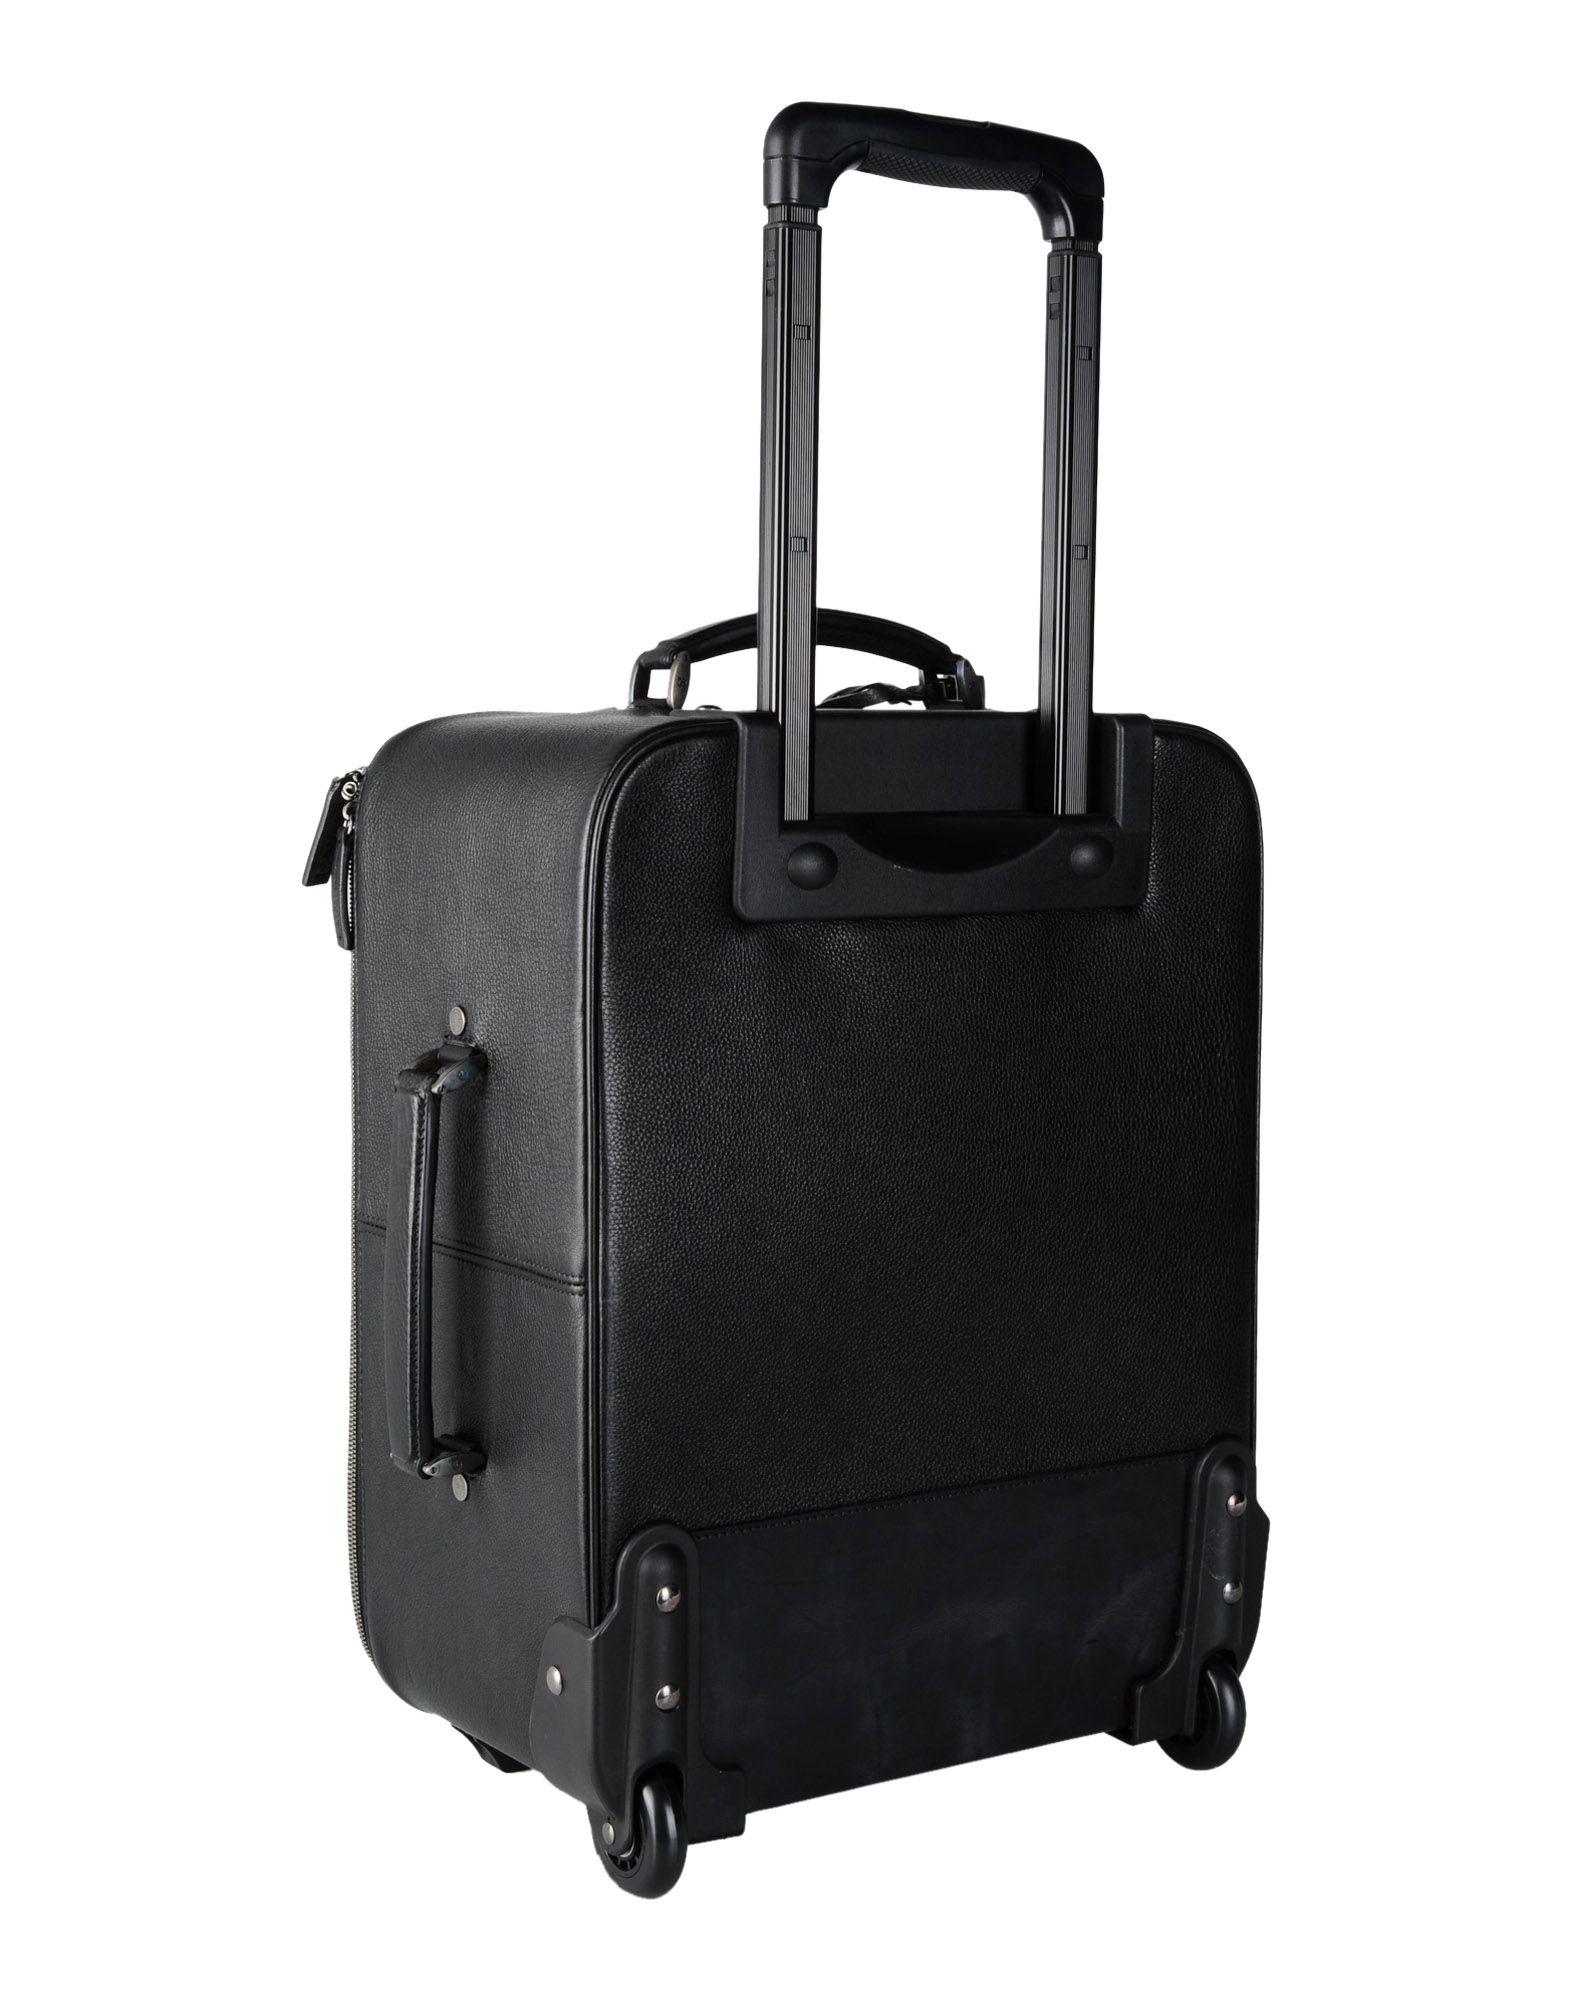 208fae4011 Lyst - Giorgio Armani Wheeled Luggage in Black for Men